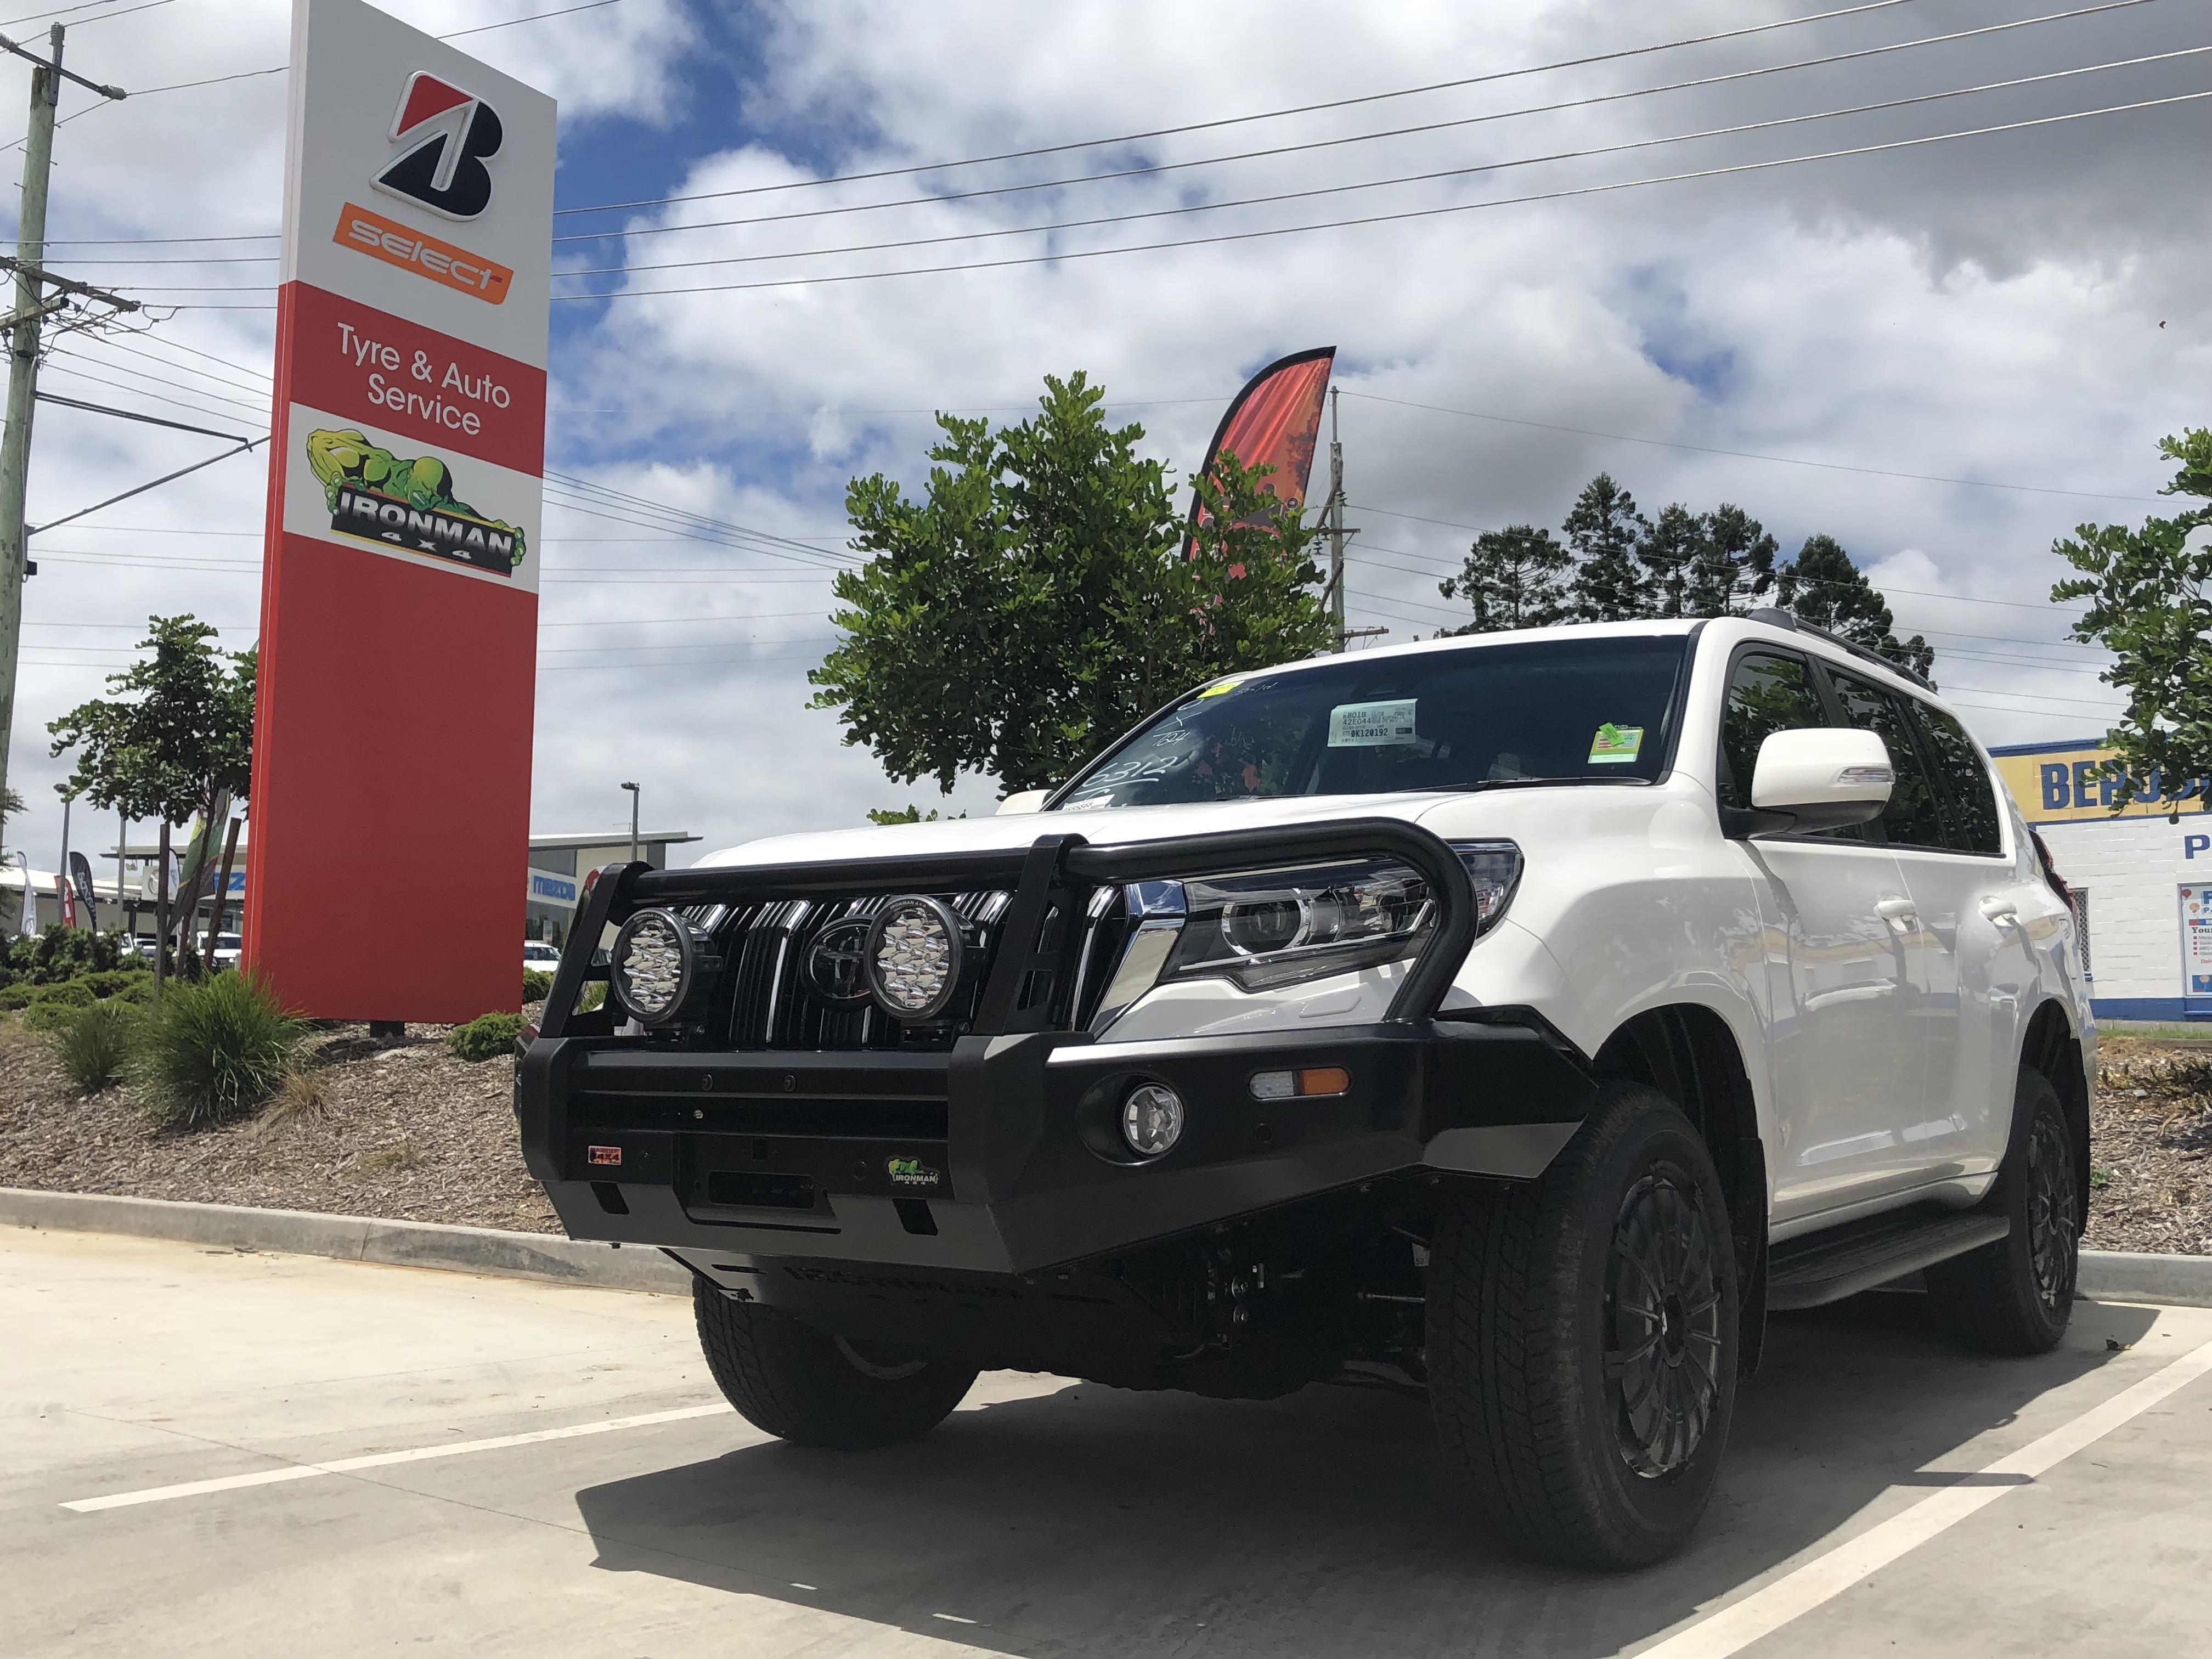 Toyota Prado fitted with Bullbar